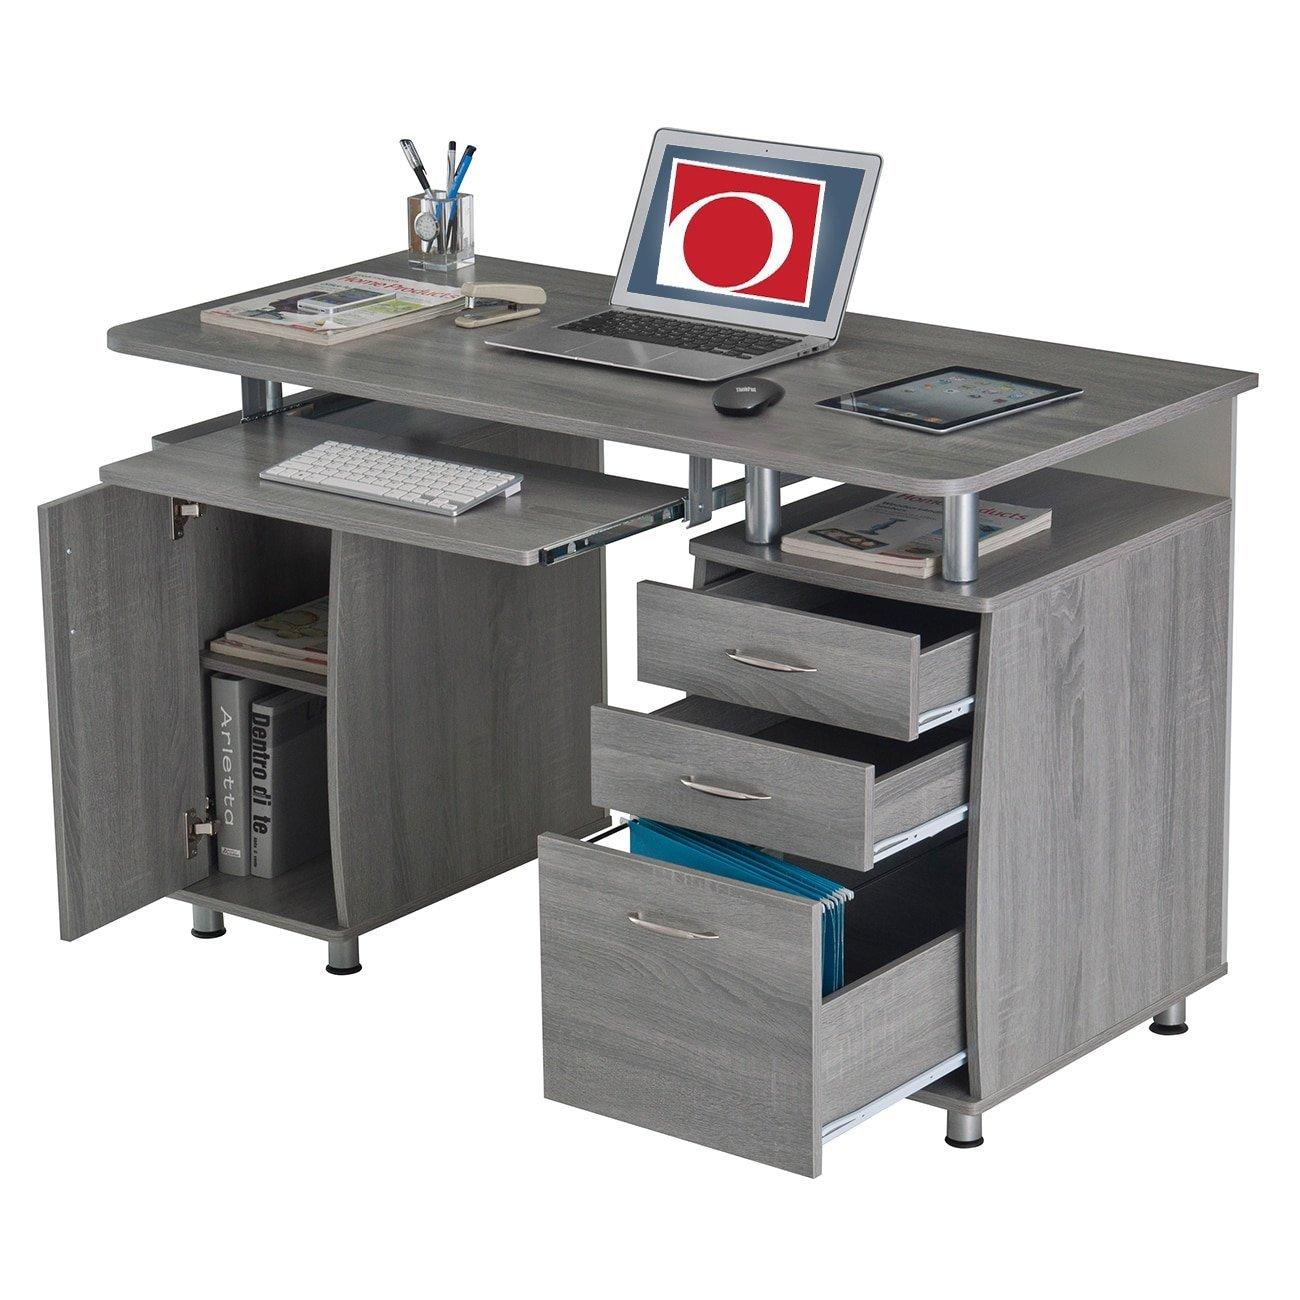 Modern Grey Multifunctional Office Desk with File Cabinet & Keyboard Tray, Perfect for Student & Secretary, Ergonomic Computer & Workstation Desk, Writing Desk, BONUS E-book